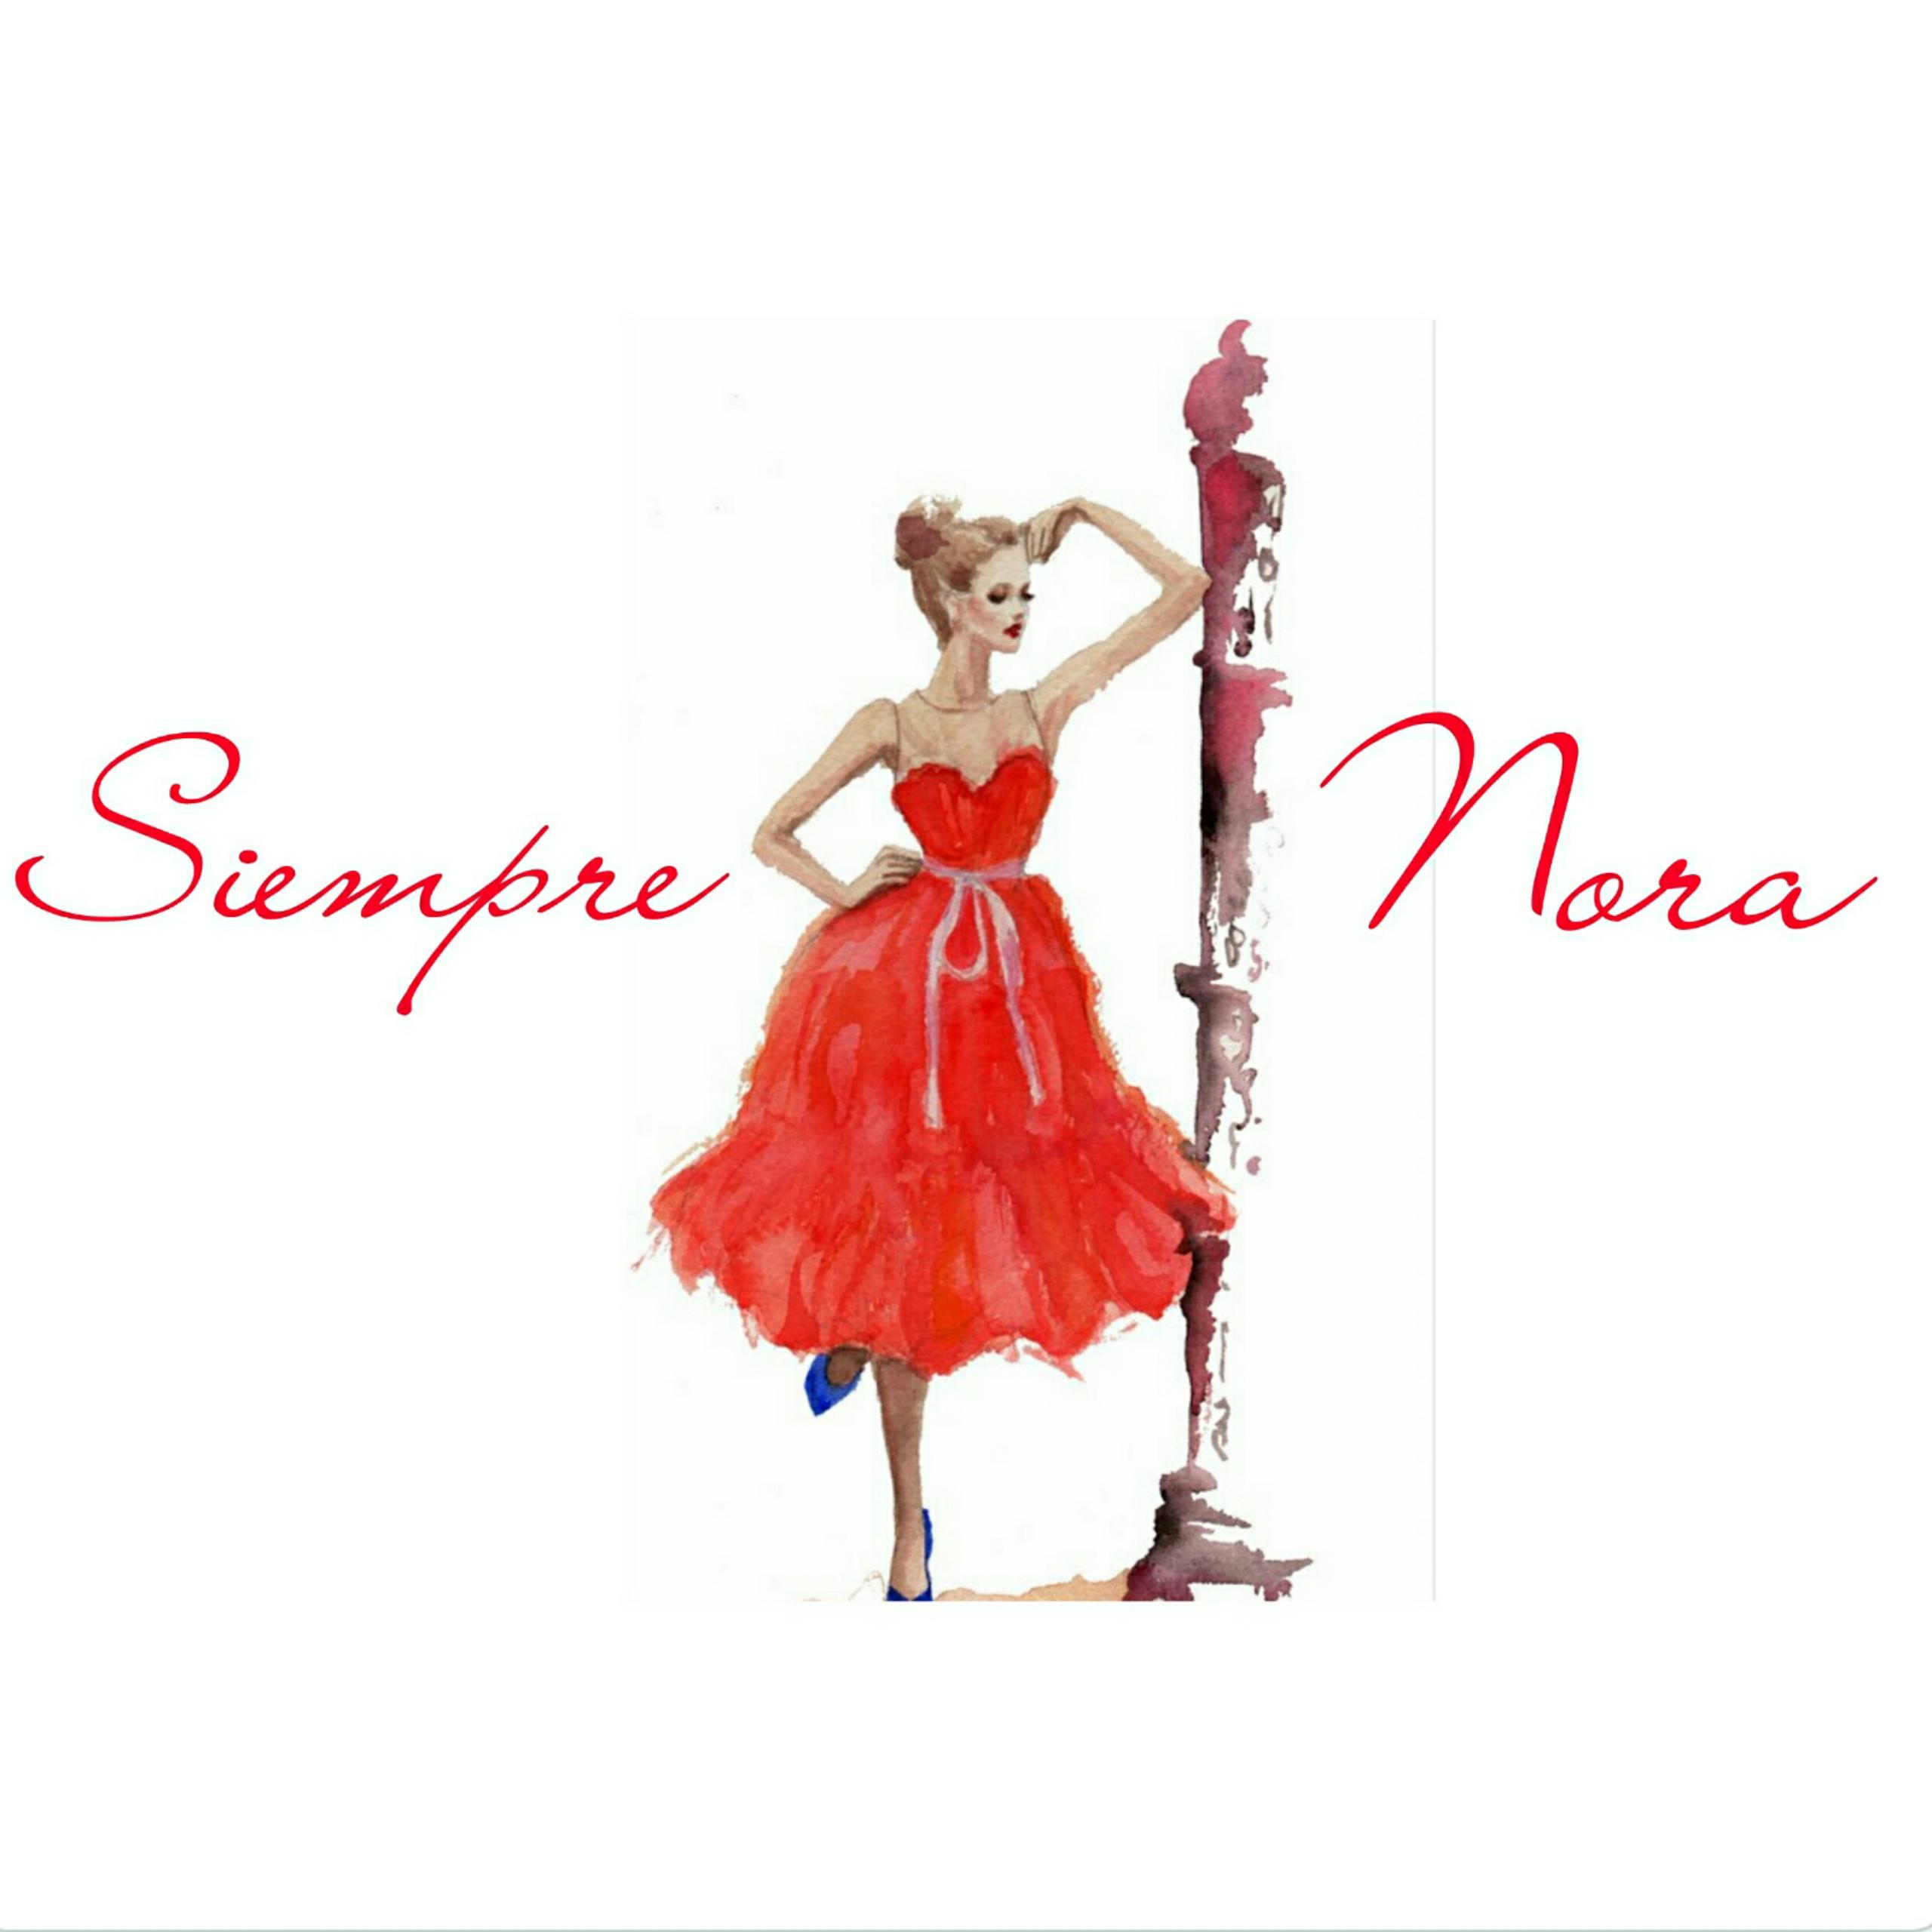 Siempre Nora